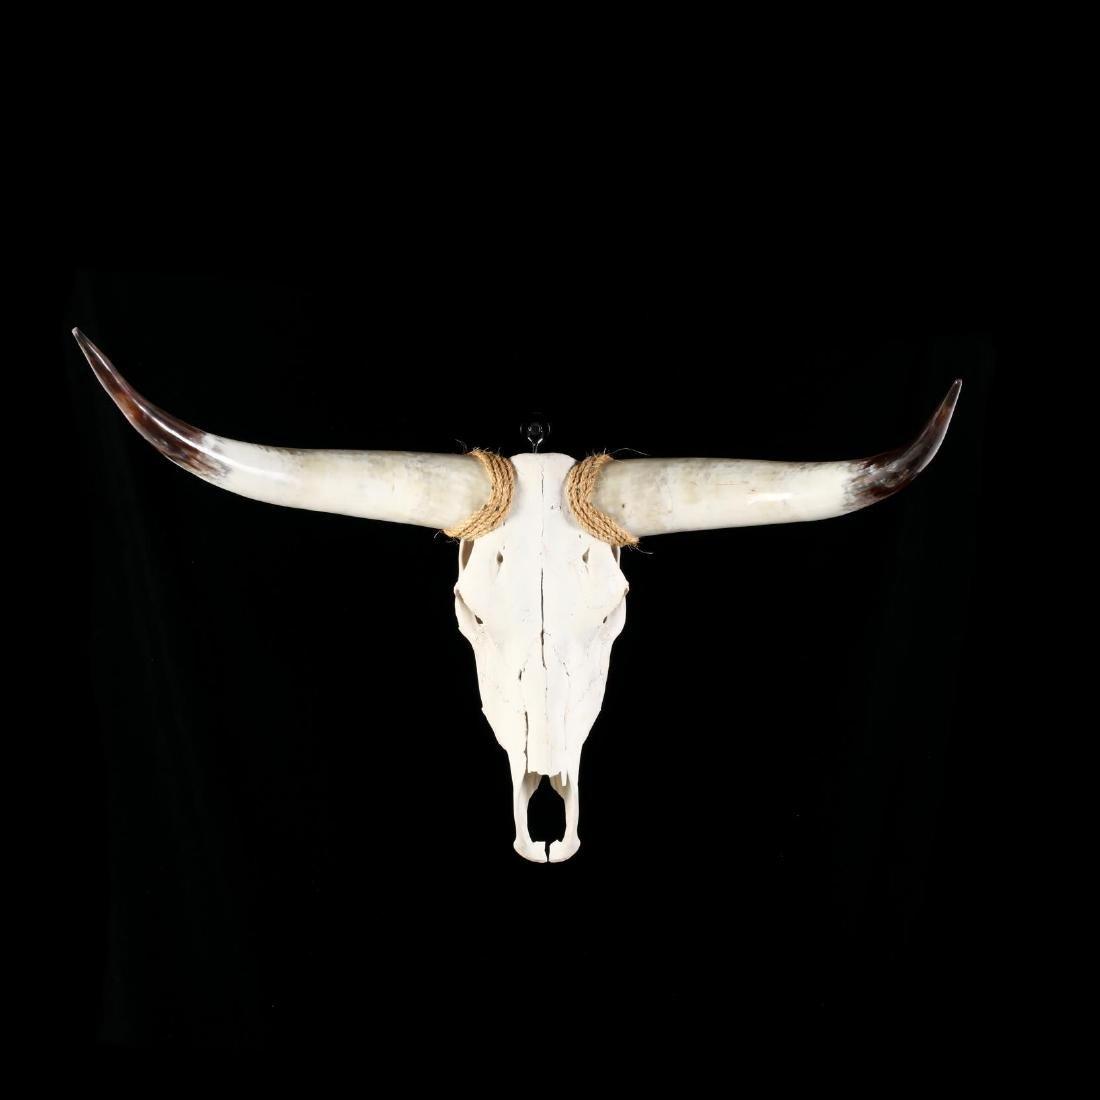 Wall Mount Longhorn Steer Skull and Horns